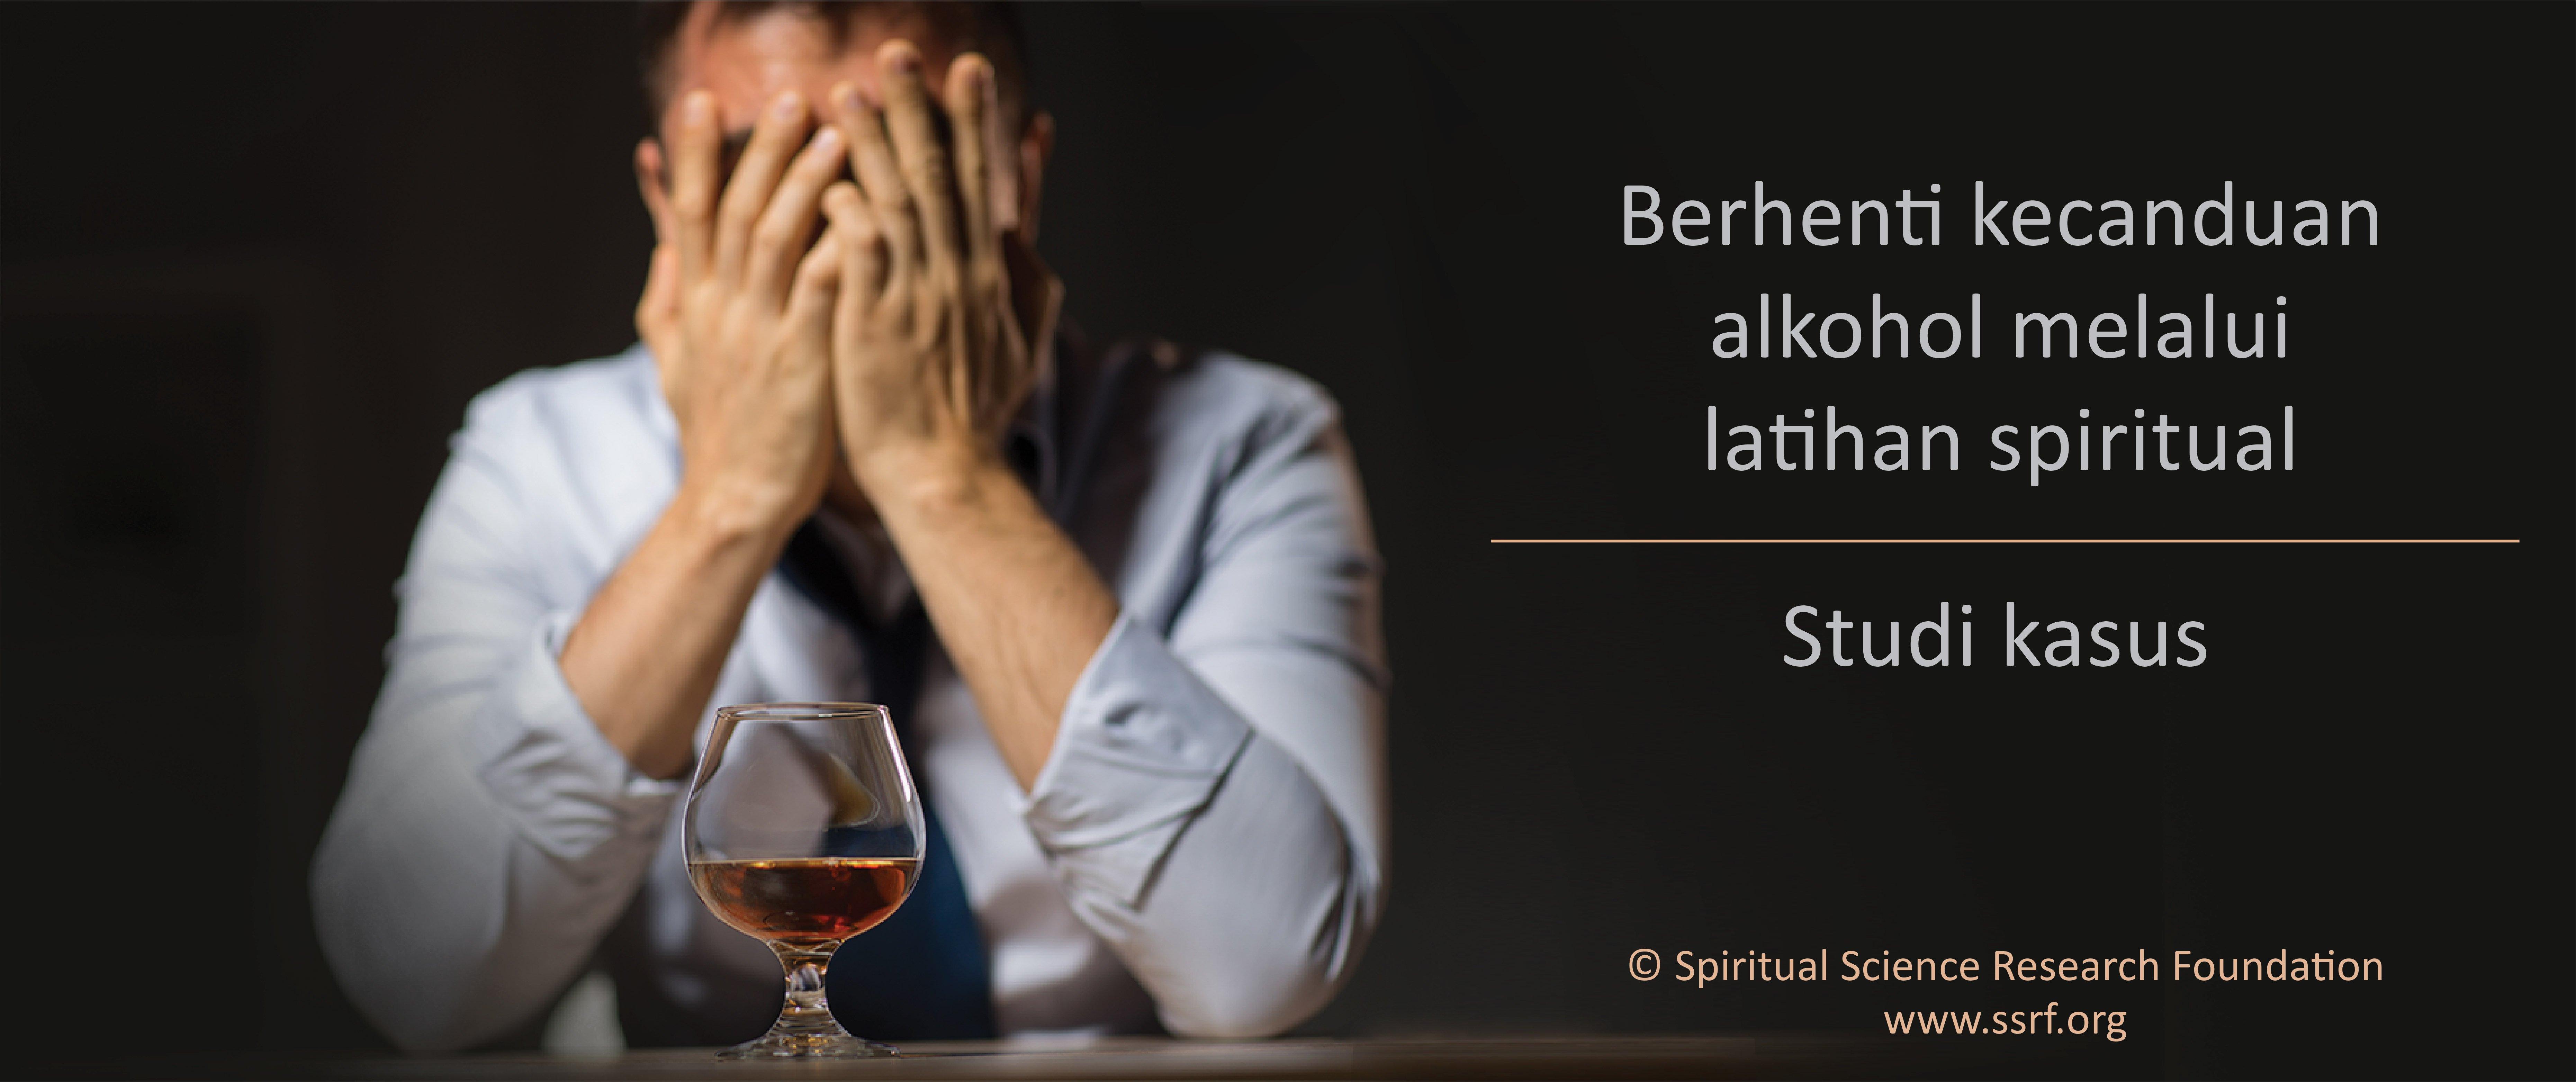 Berhenti kecanduan alkohol melalui latihan spiritual